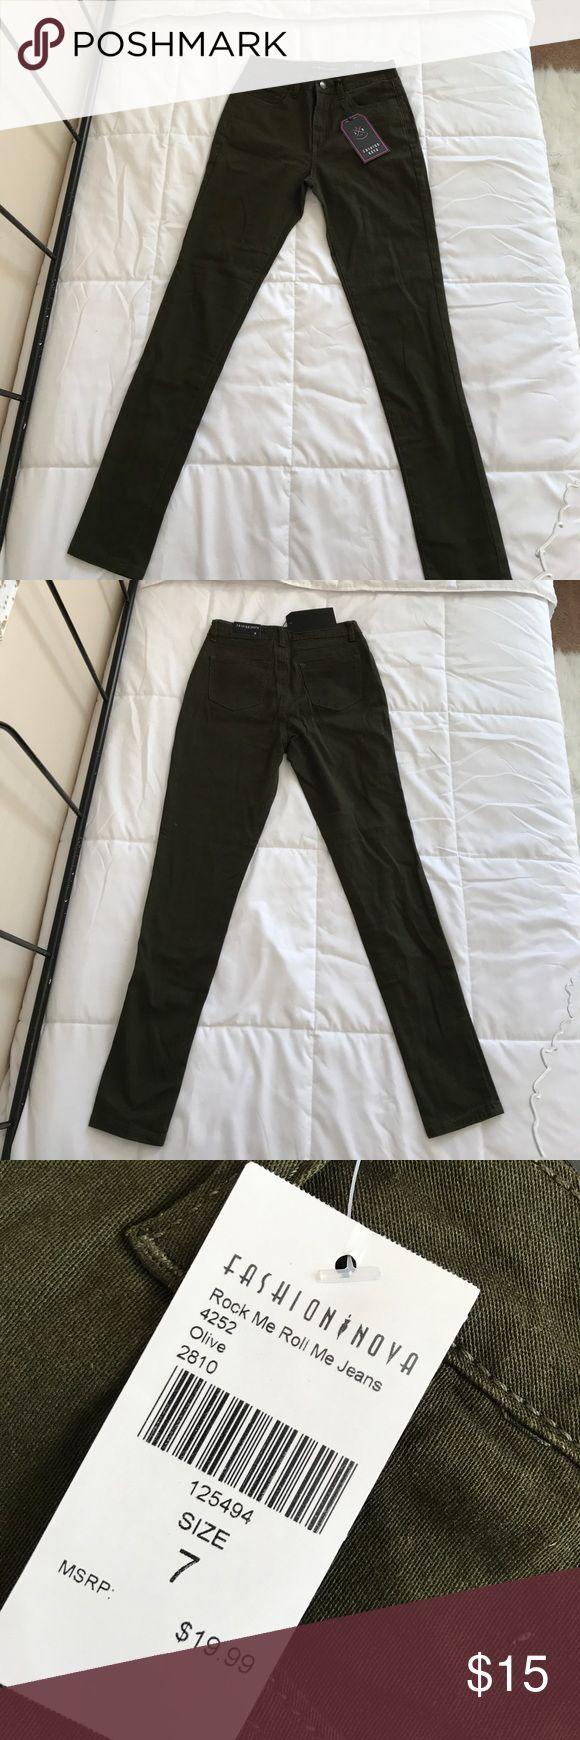 "FASHION NOVA JEANS Fashion Nova ""Rock Me Roll Me Jeans"". Never worn before. Received wrong size, but never sent them back. Brand new with tags! Fashion Nova Jeans Skinny"